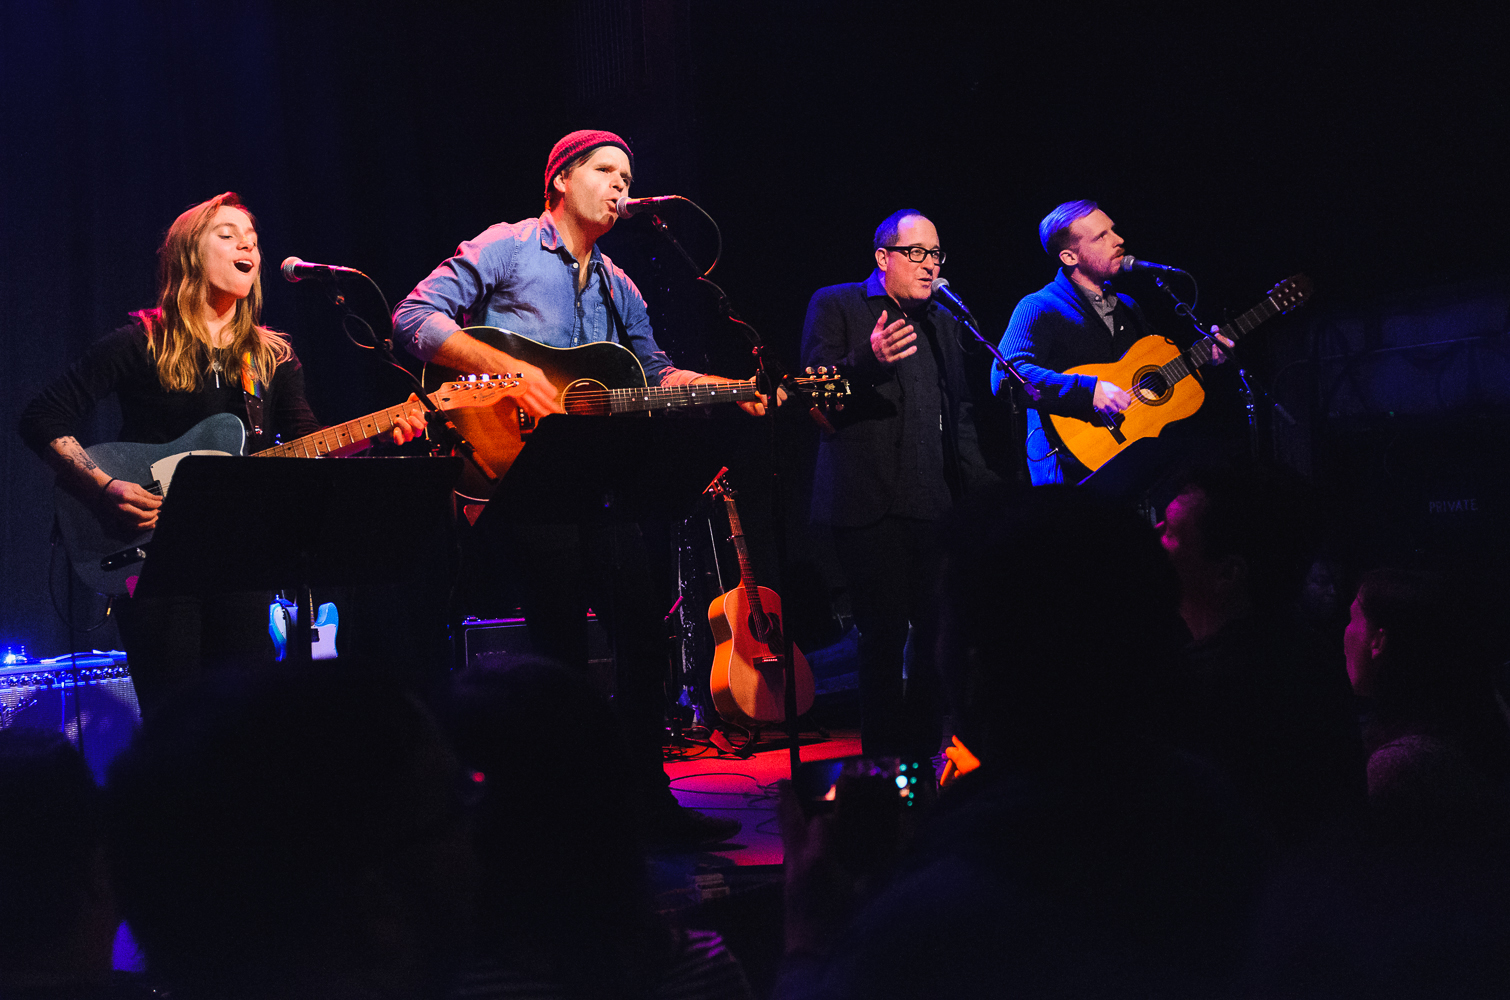 Tiny Changes- A Celebration of the Songs of Scott Hutchison Ben Kaye Julien Baker Ben Gibbard Craig Finn Kevin Devine-3